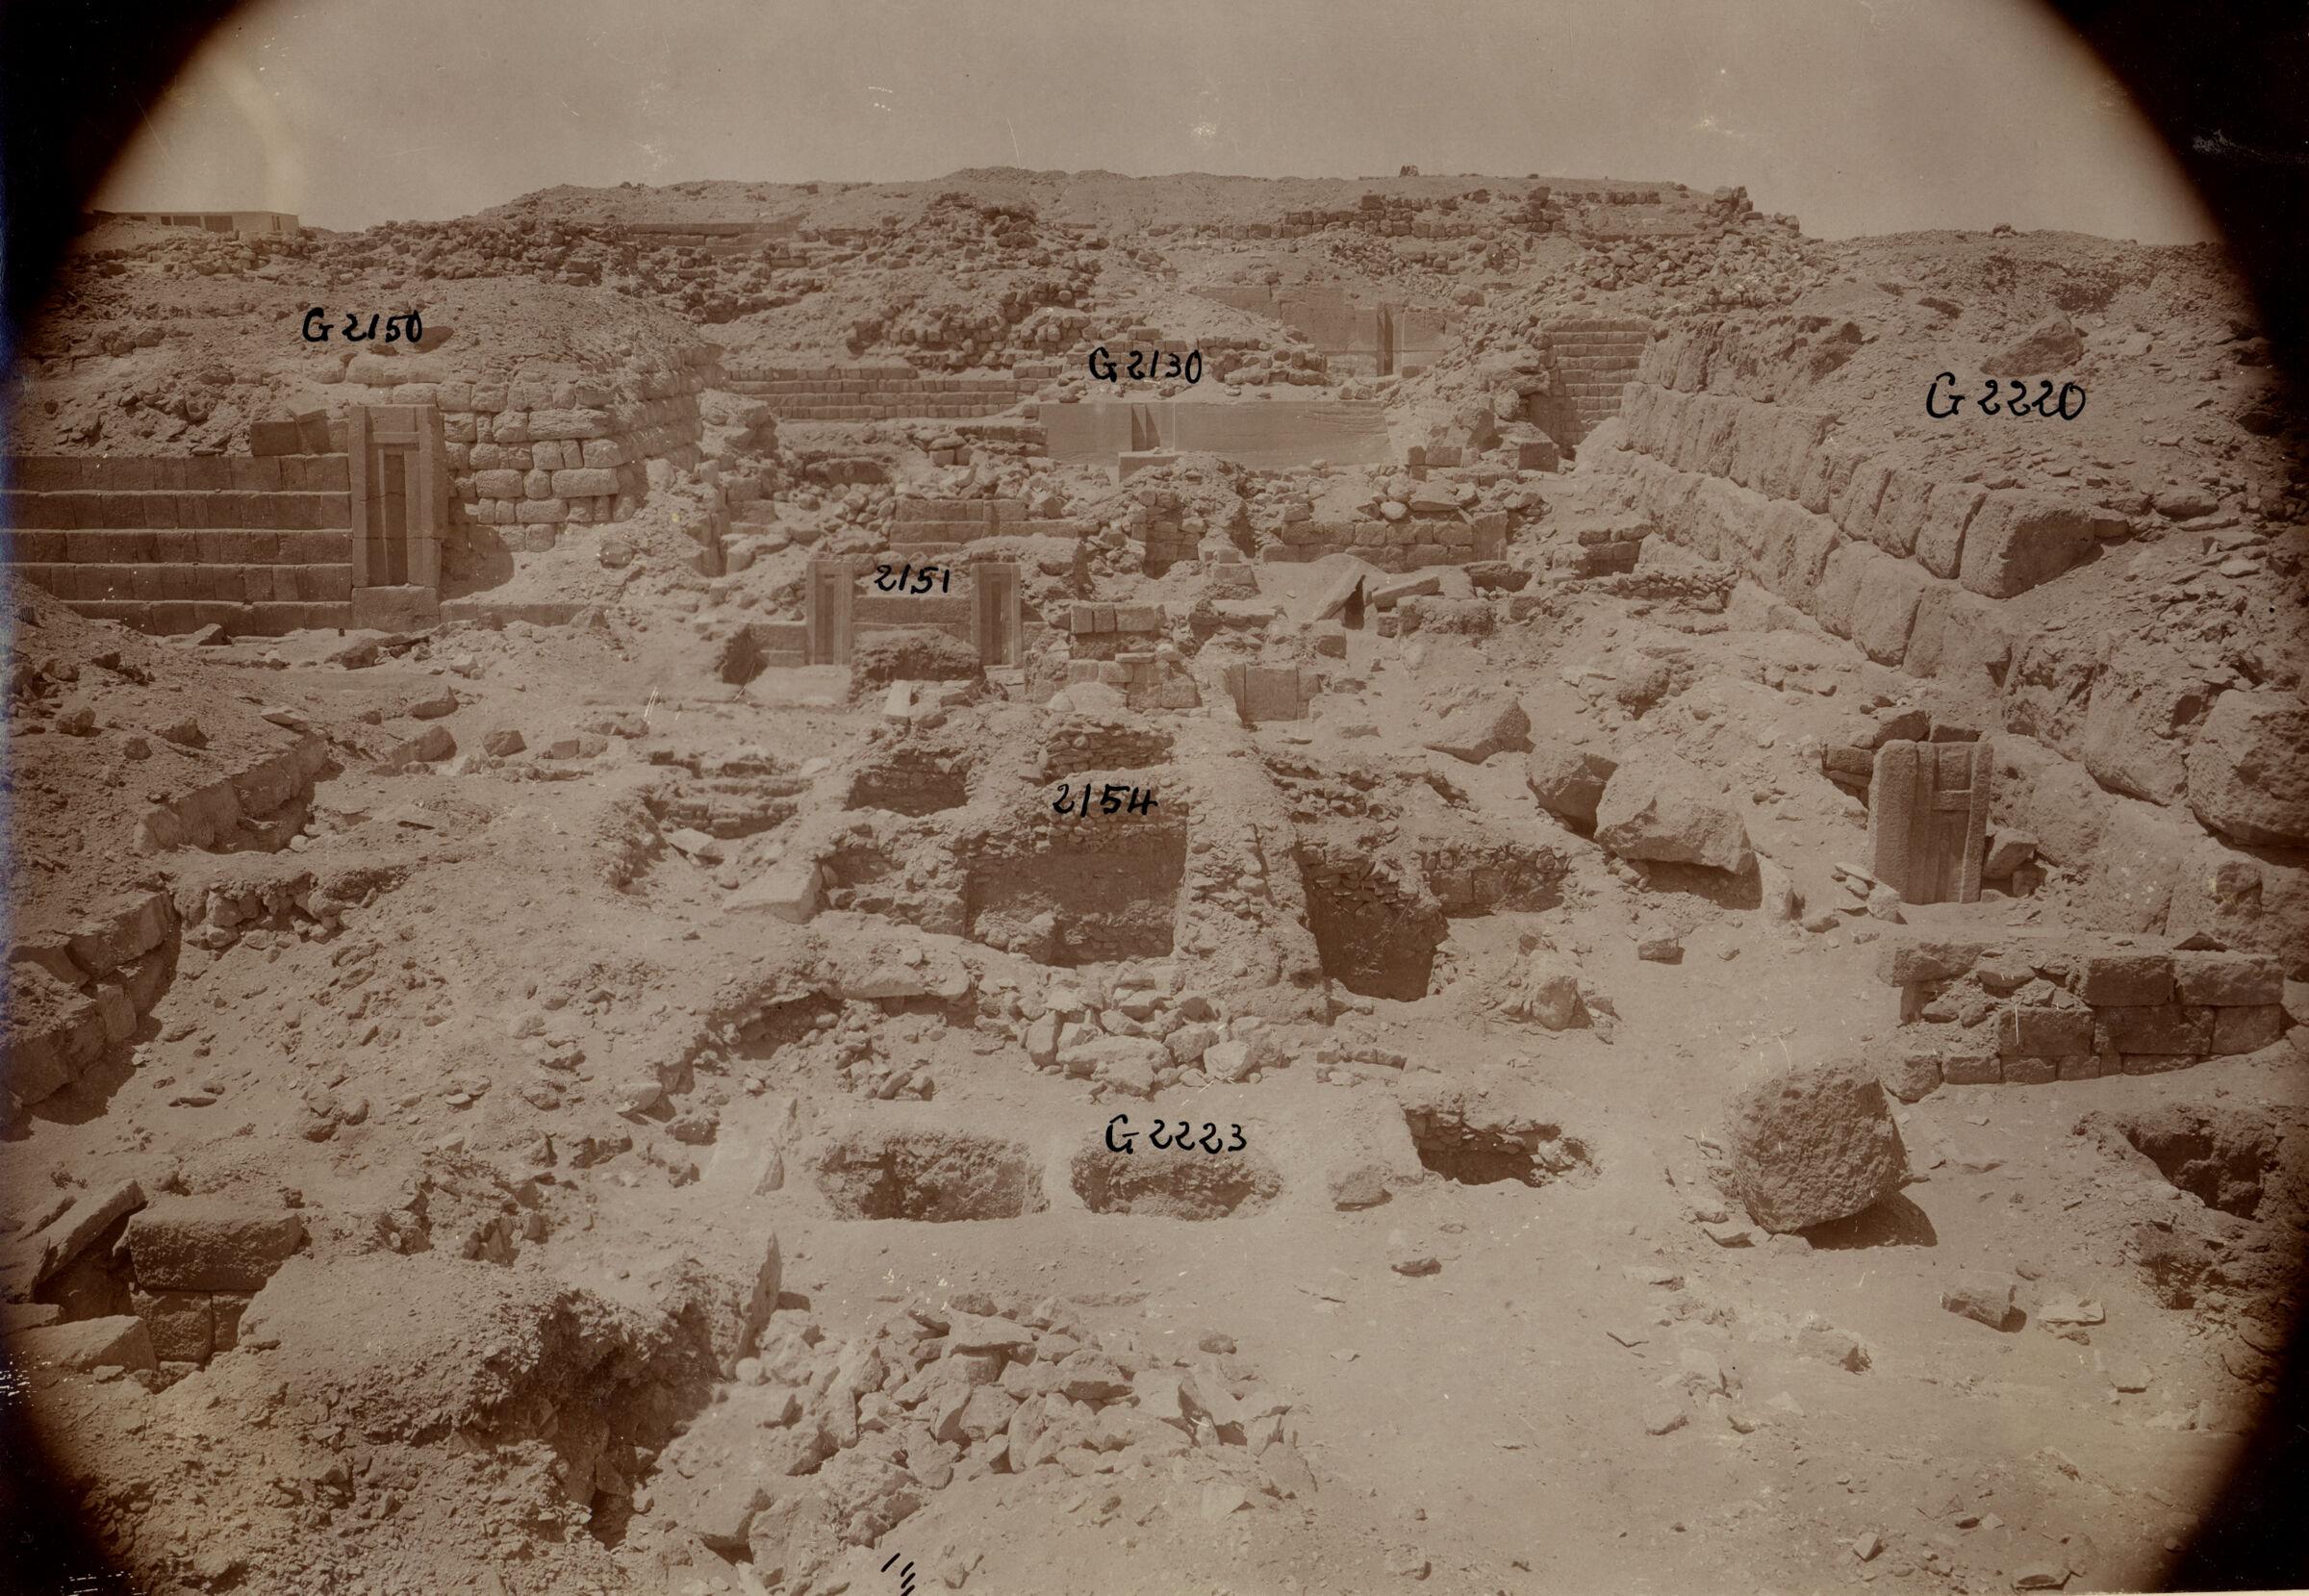 Western Cemetery: Site: Giza; View: G 2170, G 2150, G 2220, G 2223, G 2223a, G 2154, G 2154a, G 2151, G 2130